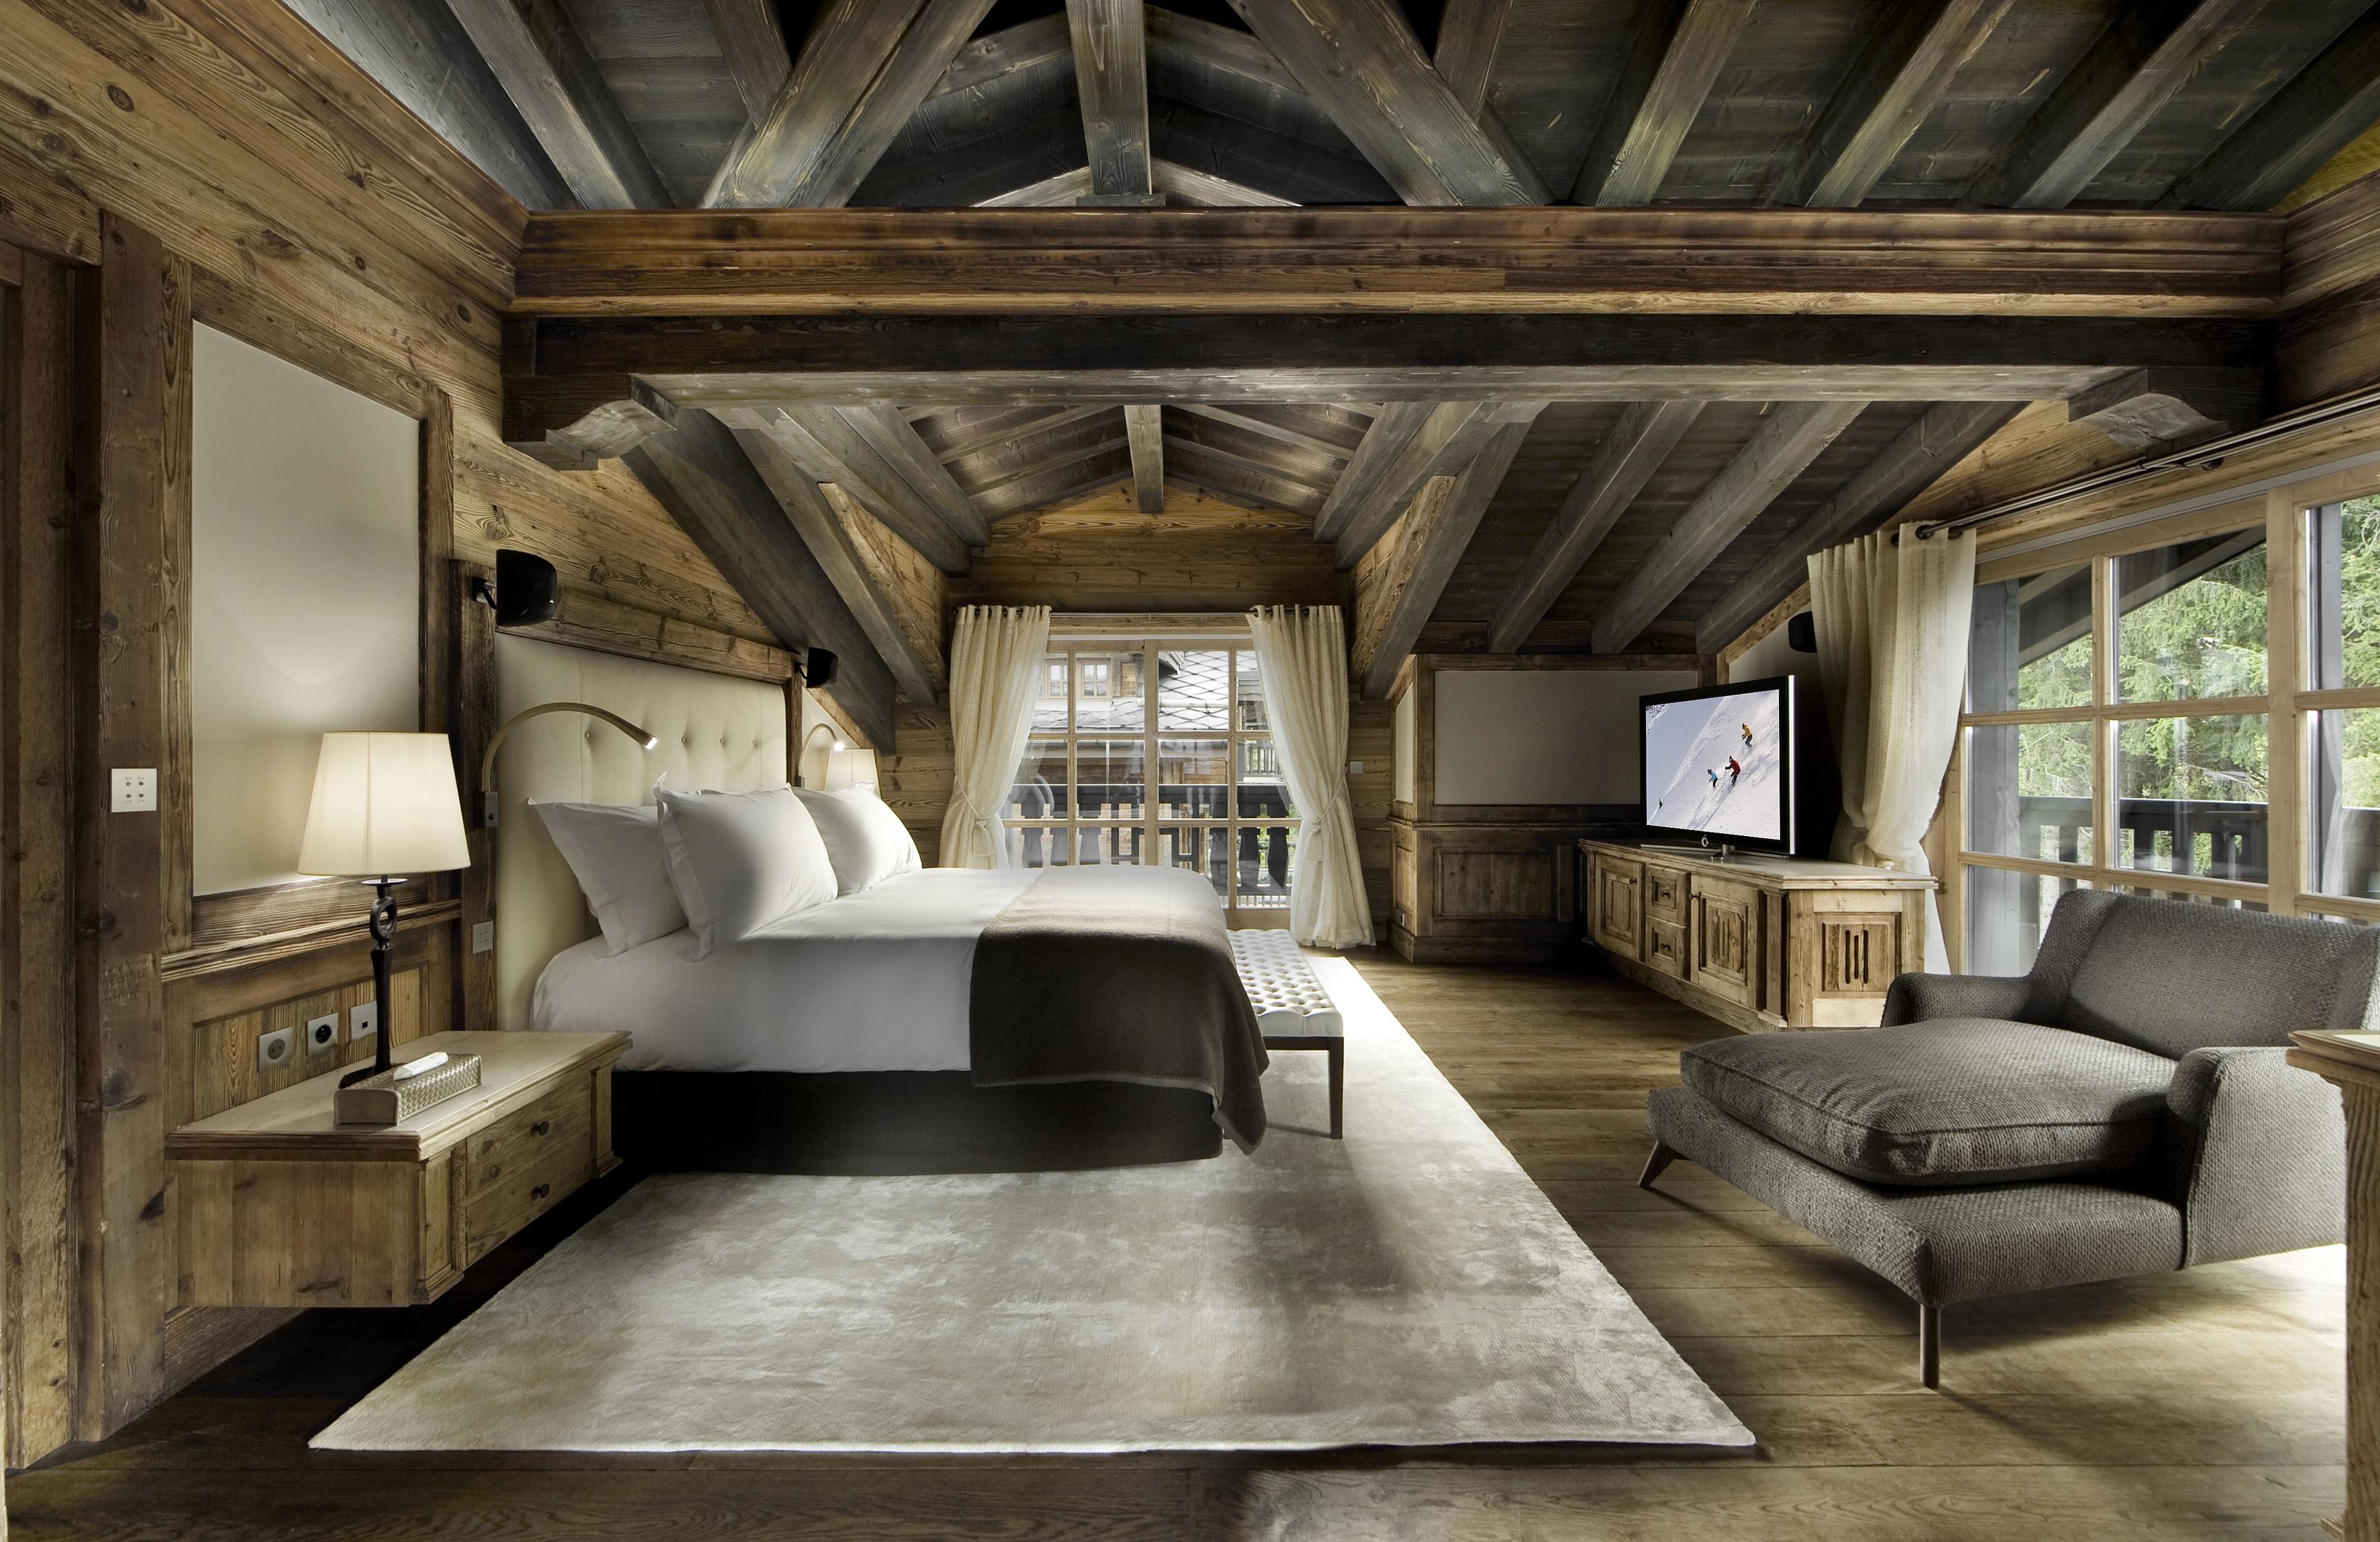 Fondos De Pantalla Arquitectura Habitaci N Interior